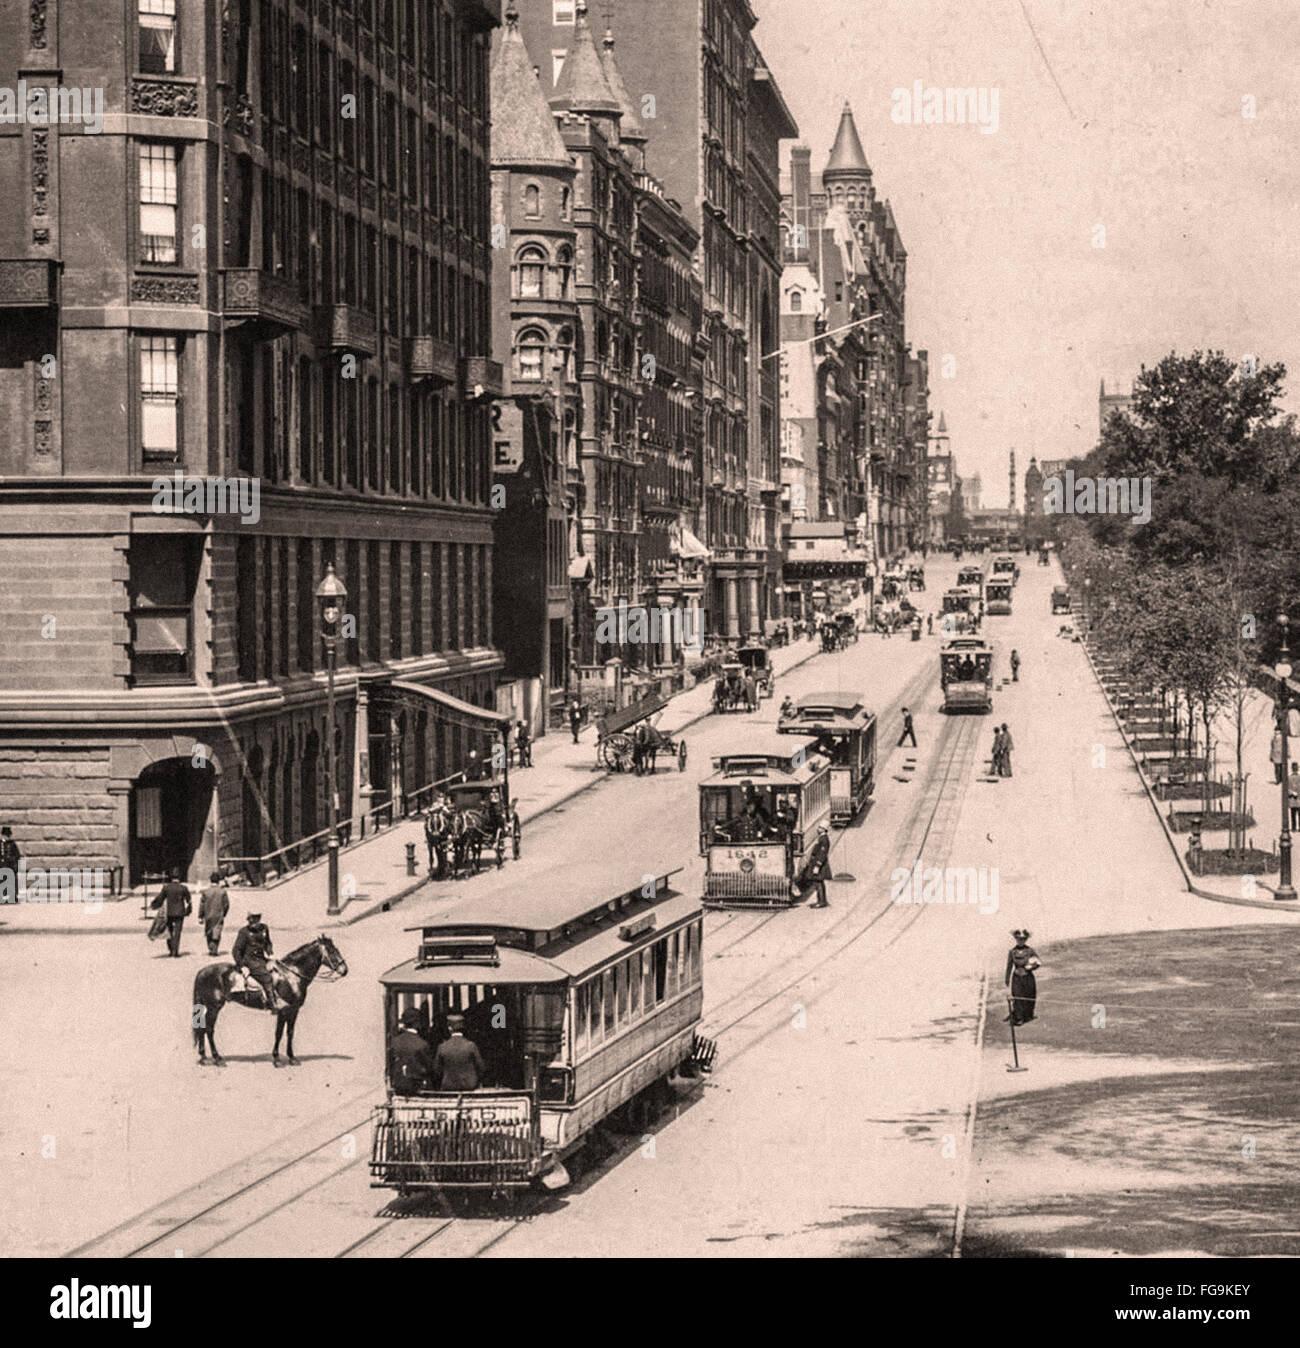 Calles de Nueva York a finales del siglo XIX Imagen De Stock